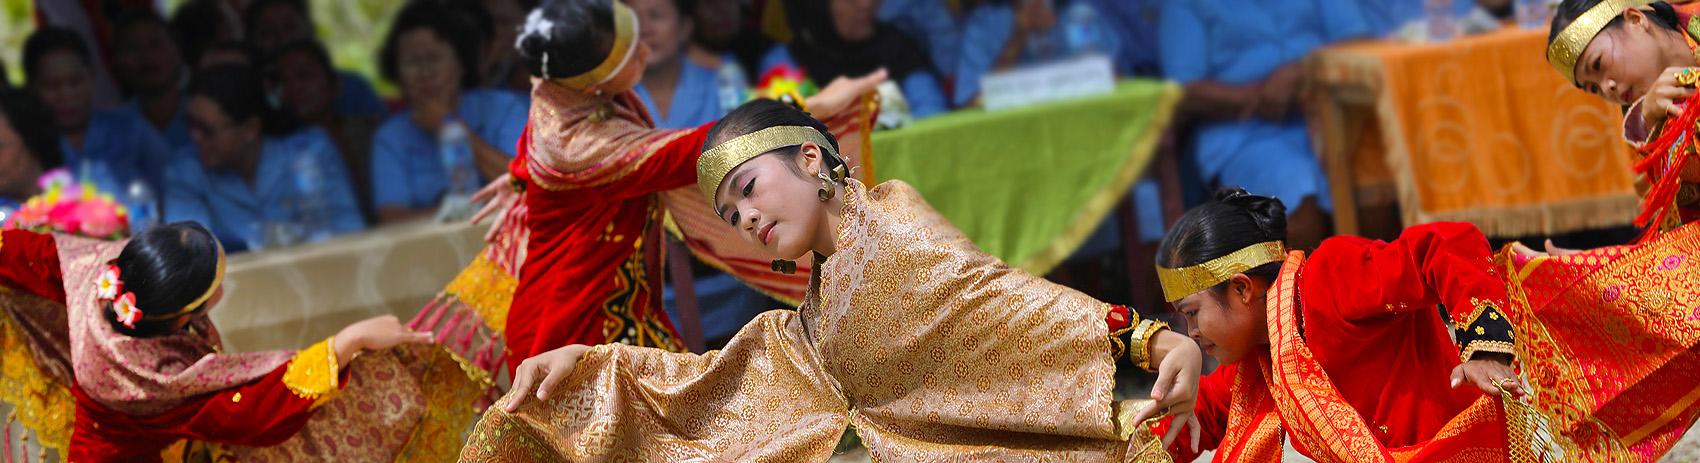 Traditional moyo dance in Afulu. North Nias (Nias Utara), Nias Island, Indonesia.